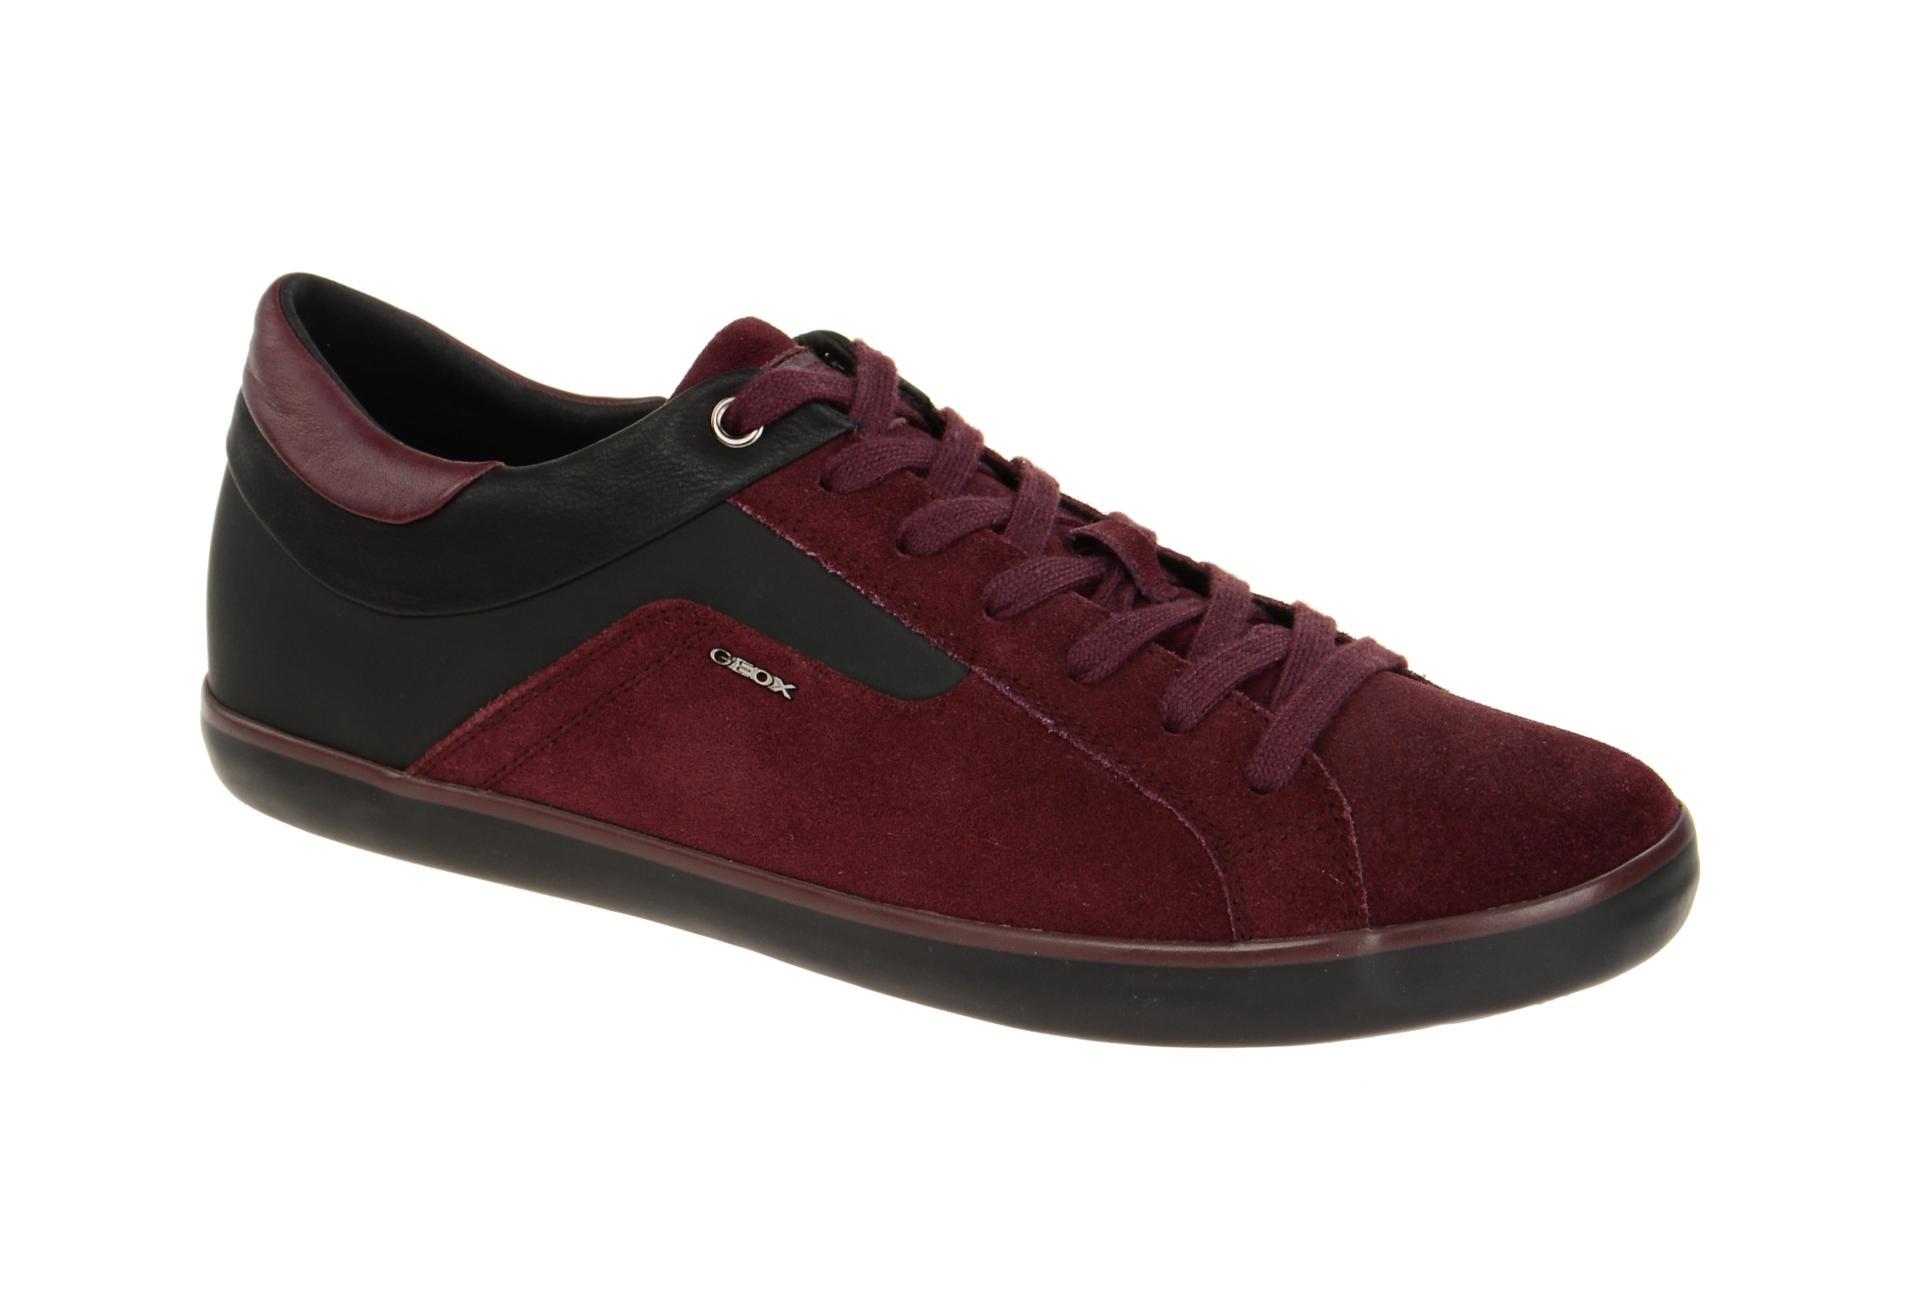 Geox sneaker schuhe box rot burgundy schuhhaus strauch shop for Ordnungssystem fa r schuhe